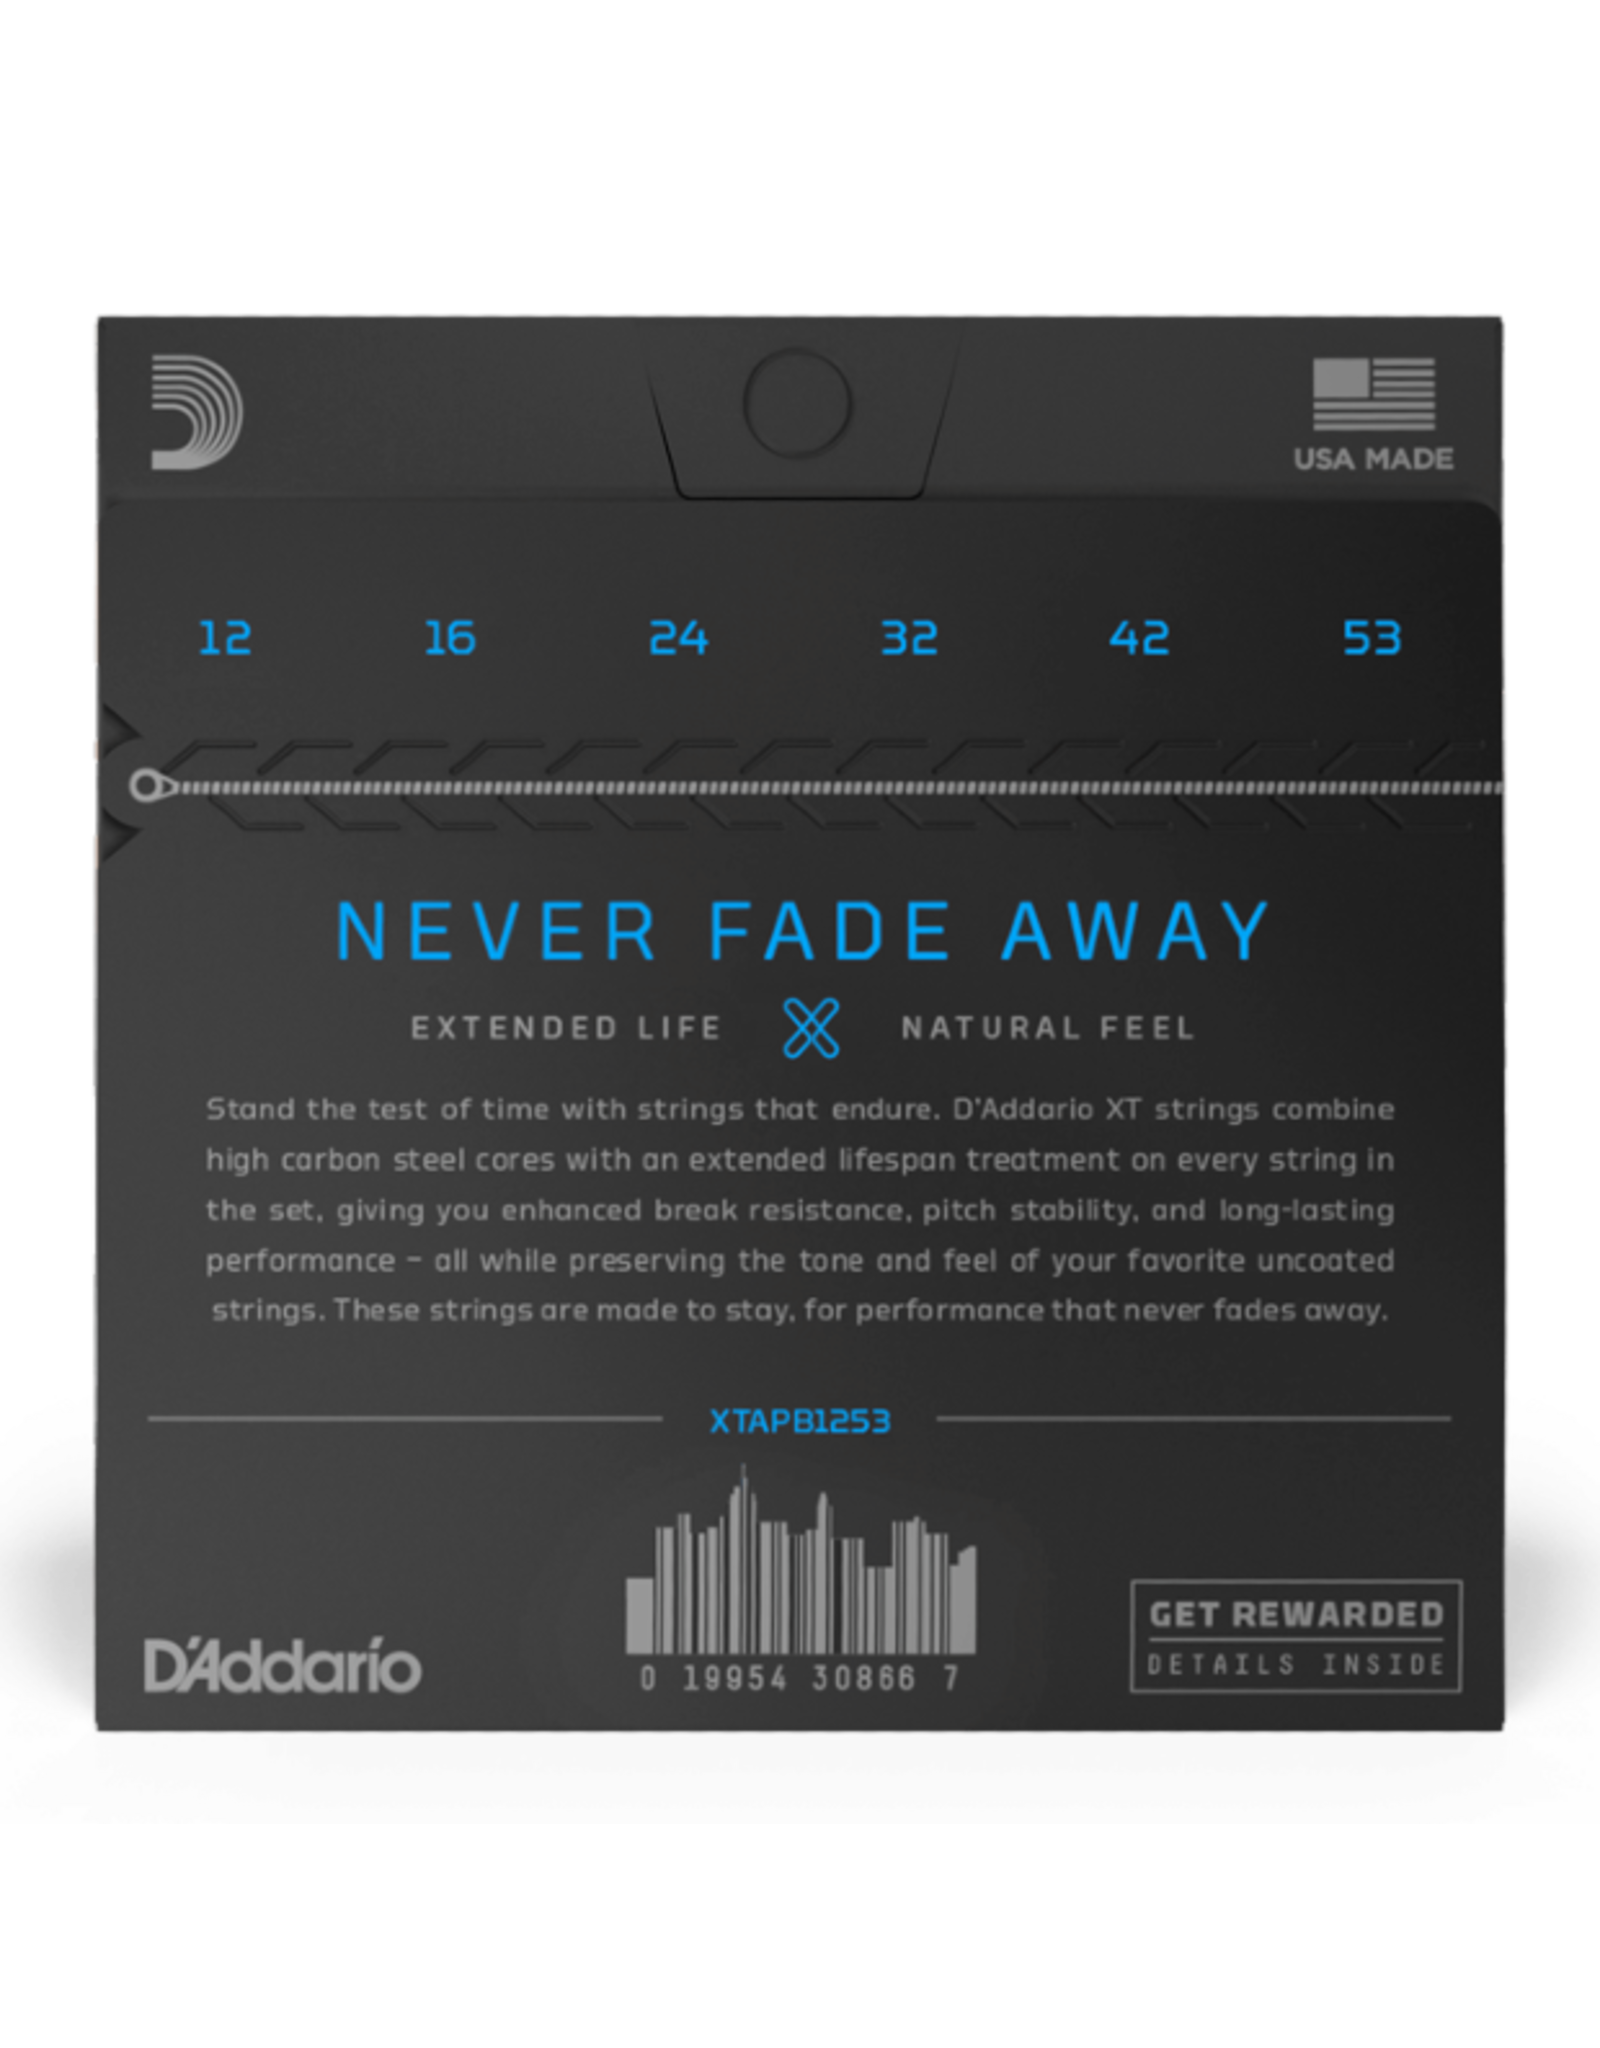 D'Addario D'Addario XT Phosphor Bronze Light Acoustic - 12-53